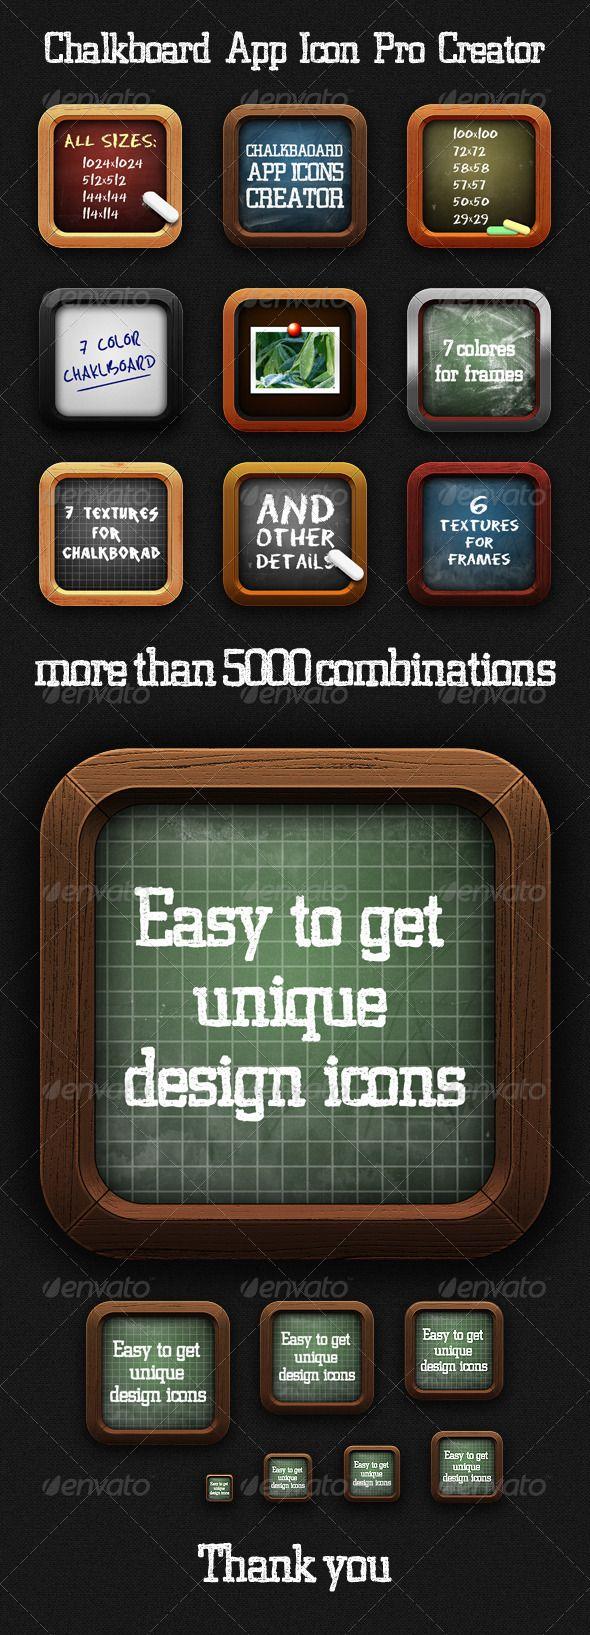 Chalkboard App Icon Pro Creator   UI Element   Ios app icon, App